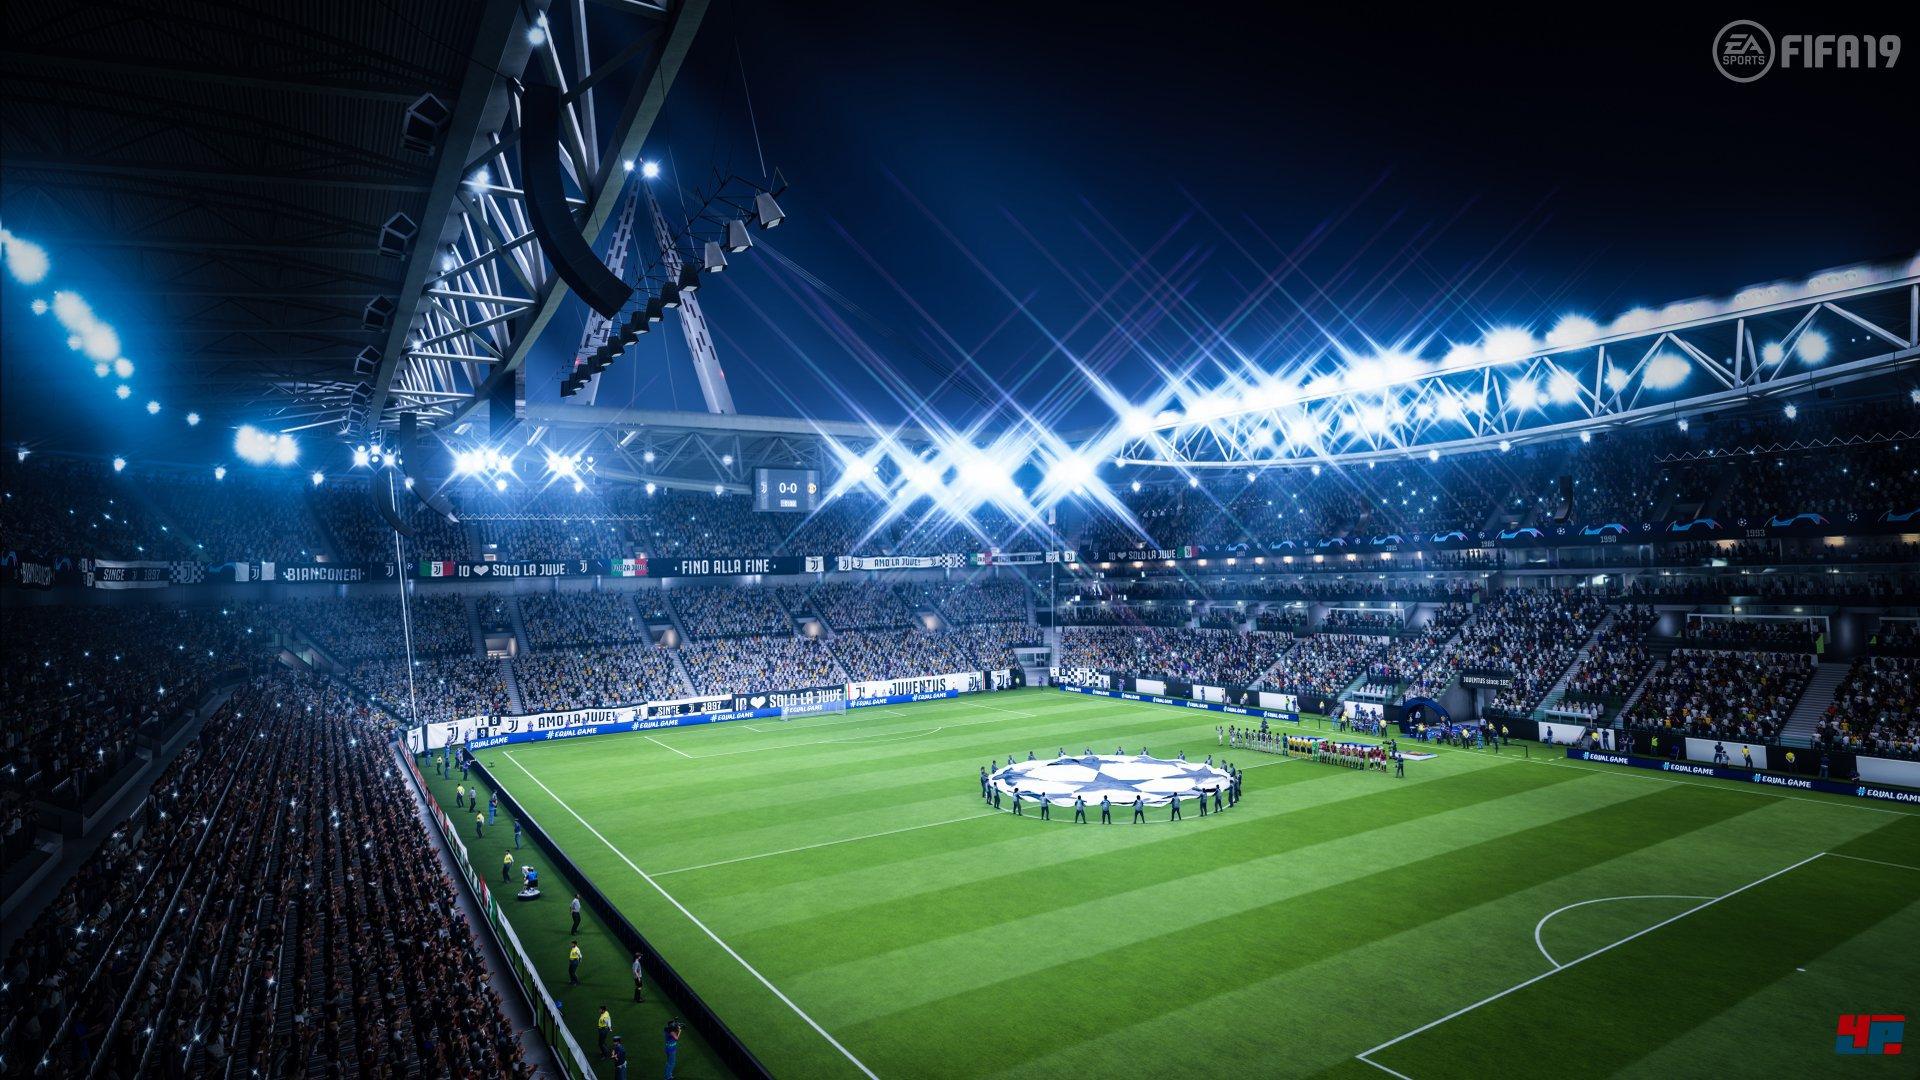 Fifa 19 Termin Uefa Champions League Und Finale Der Alex Hunter